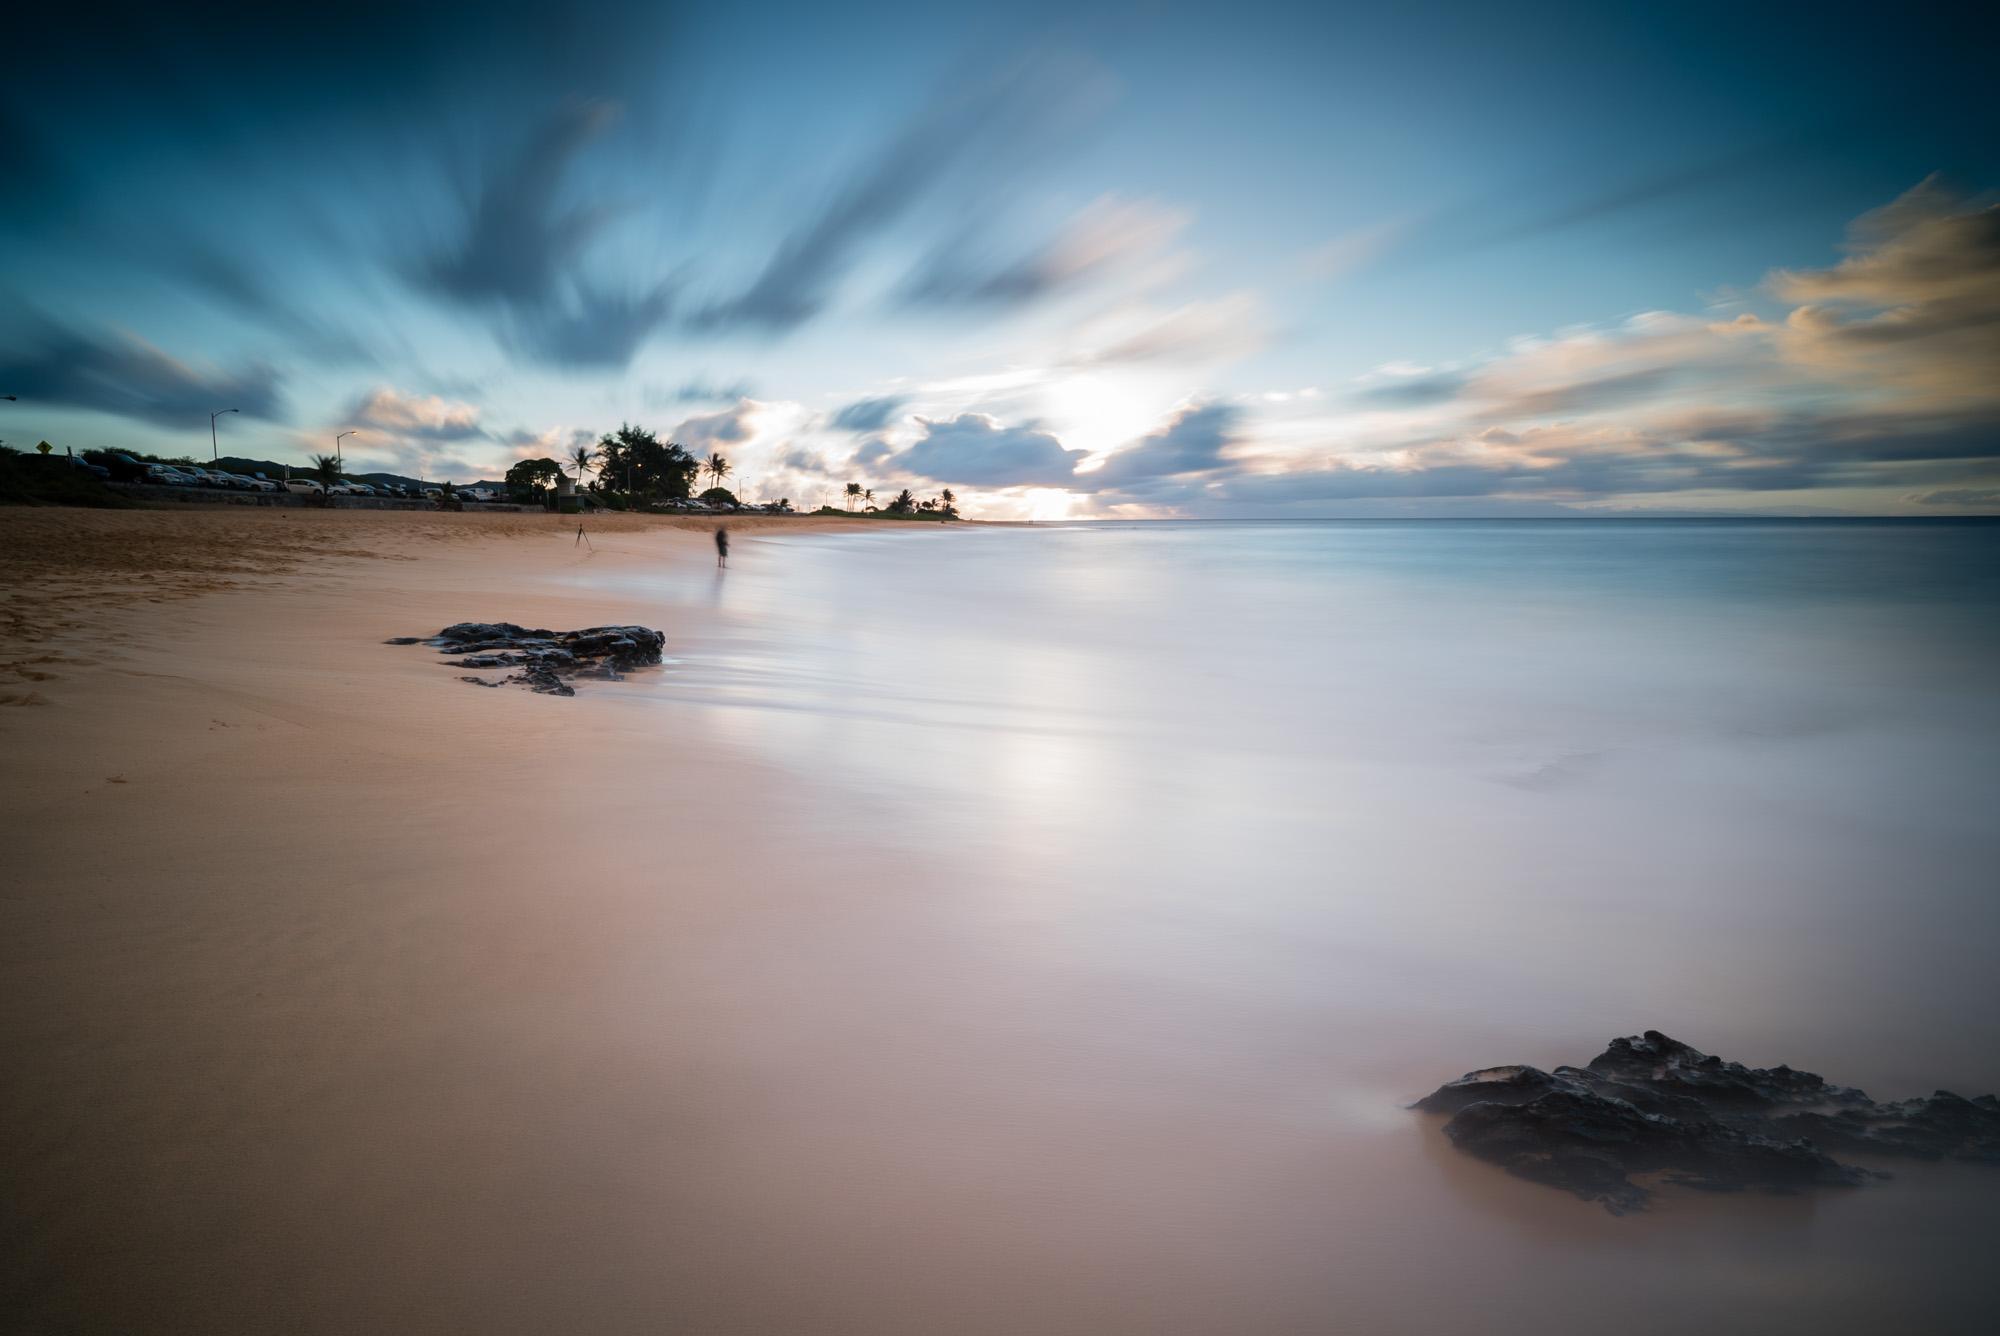 Sandy Beach Park Lee Filter Big Stopper & 3 stop medium grad Sony A7S II    121 sec.    f/8     ISO 50     Zeiss Batis 18mm  Edited in Lightroom CC 2015  Copyright 2016 Ryan Sakamoto, All rights reserved